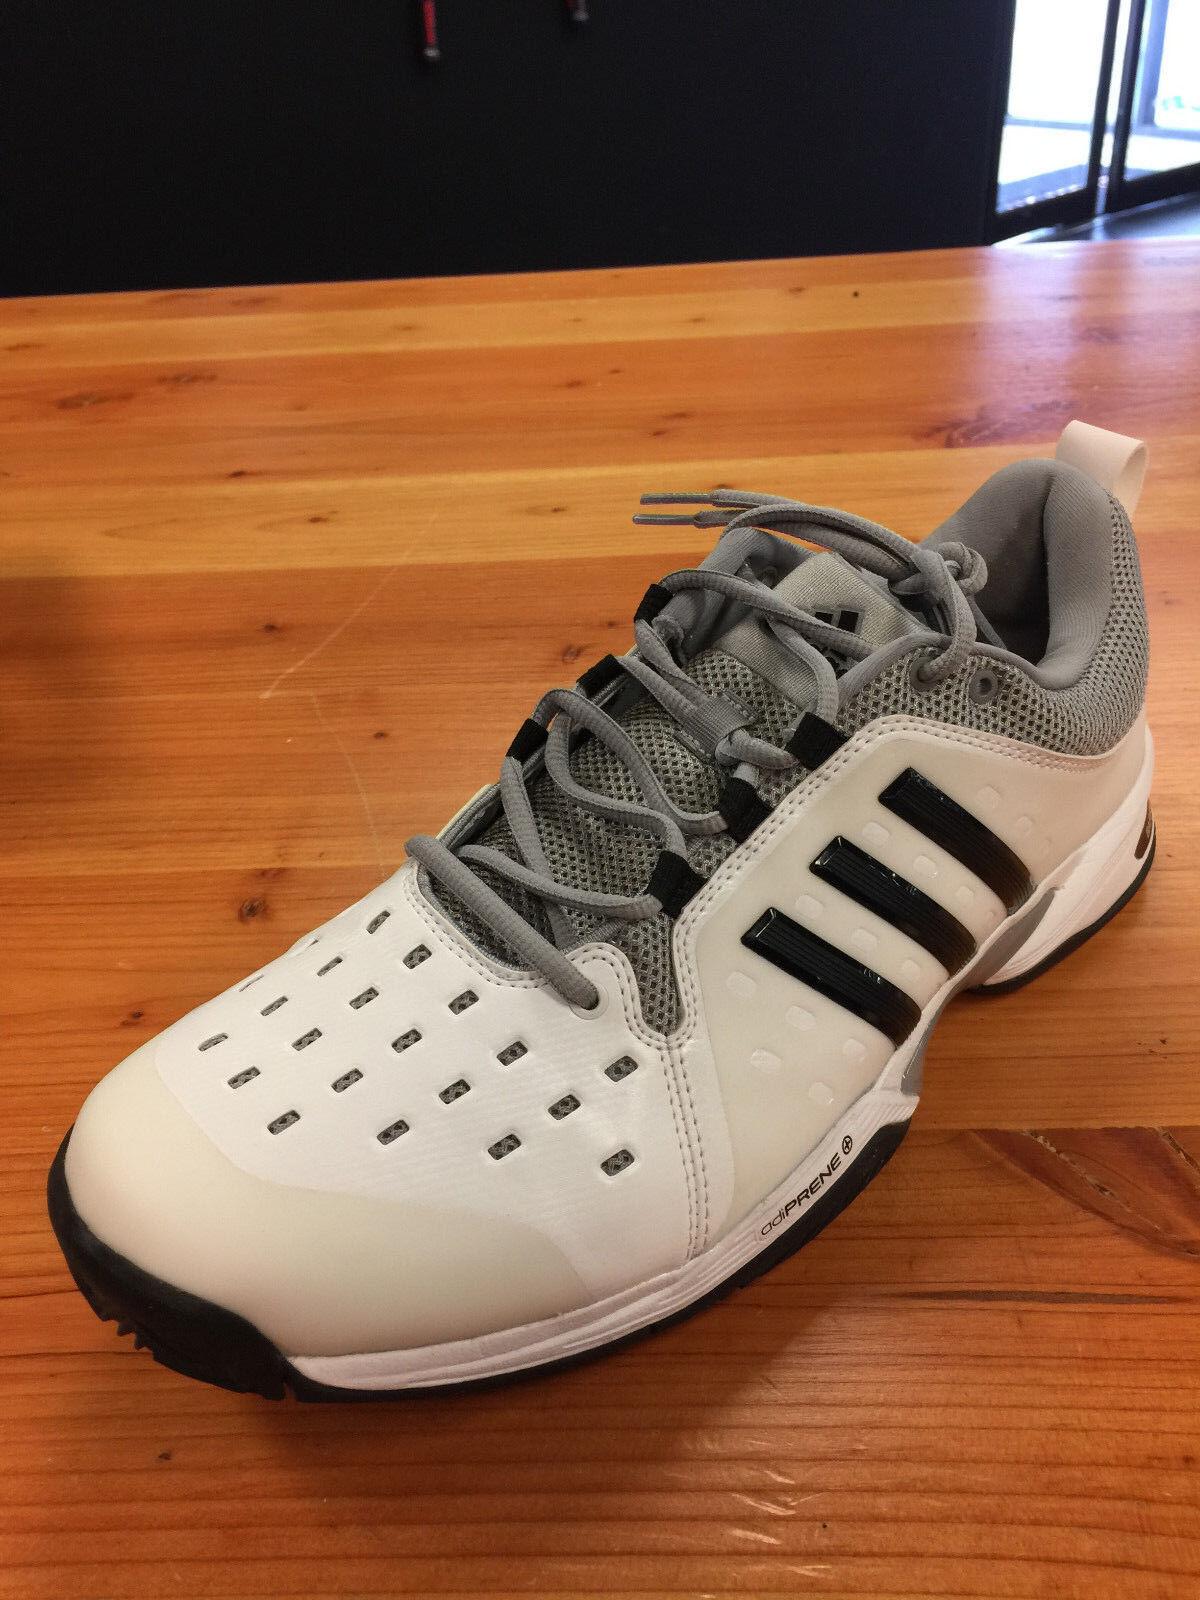 Men's Adidas Barricade Barricade Barricade Classic Preowned Tennis Shoe Size 12.5 5f6438